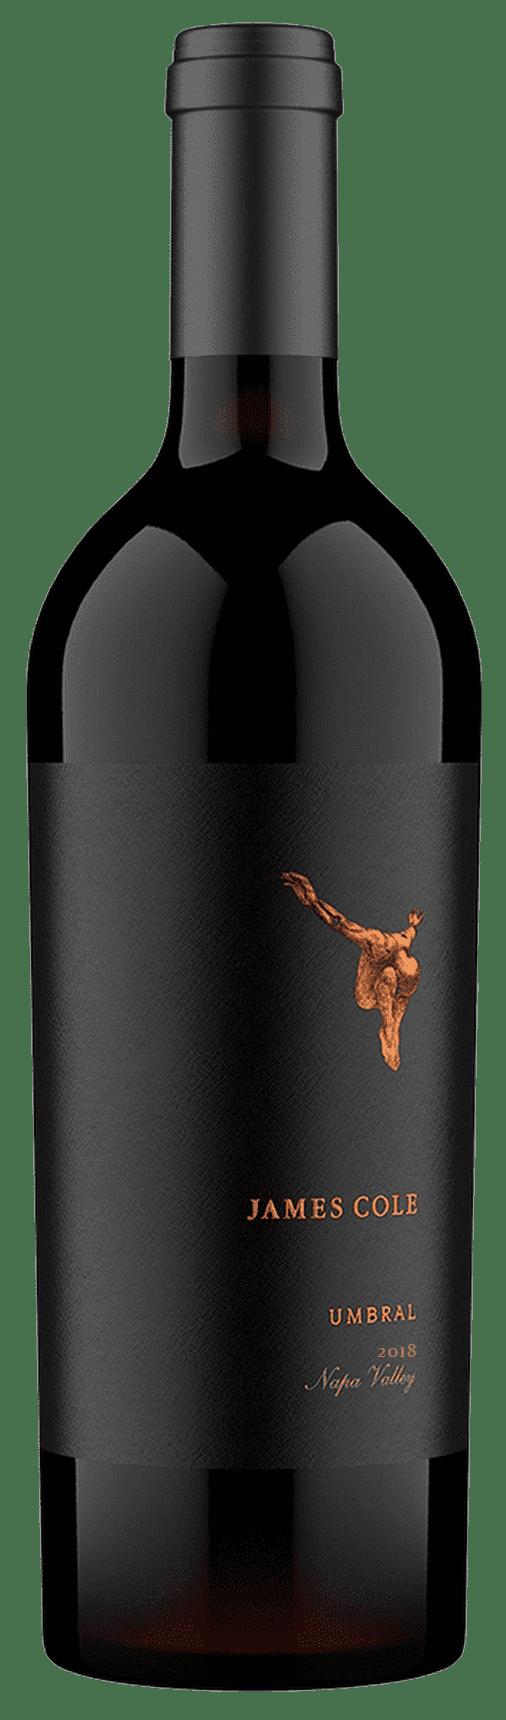 2018 Umbral Reserve Cabernet Sauvignon